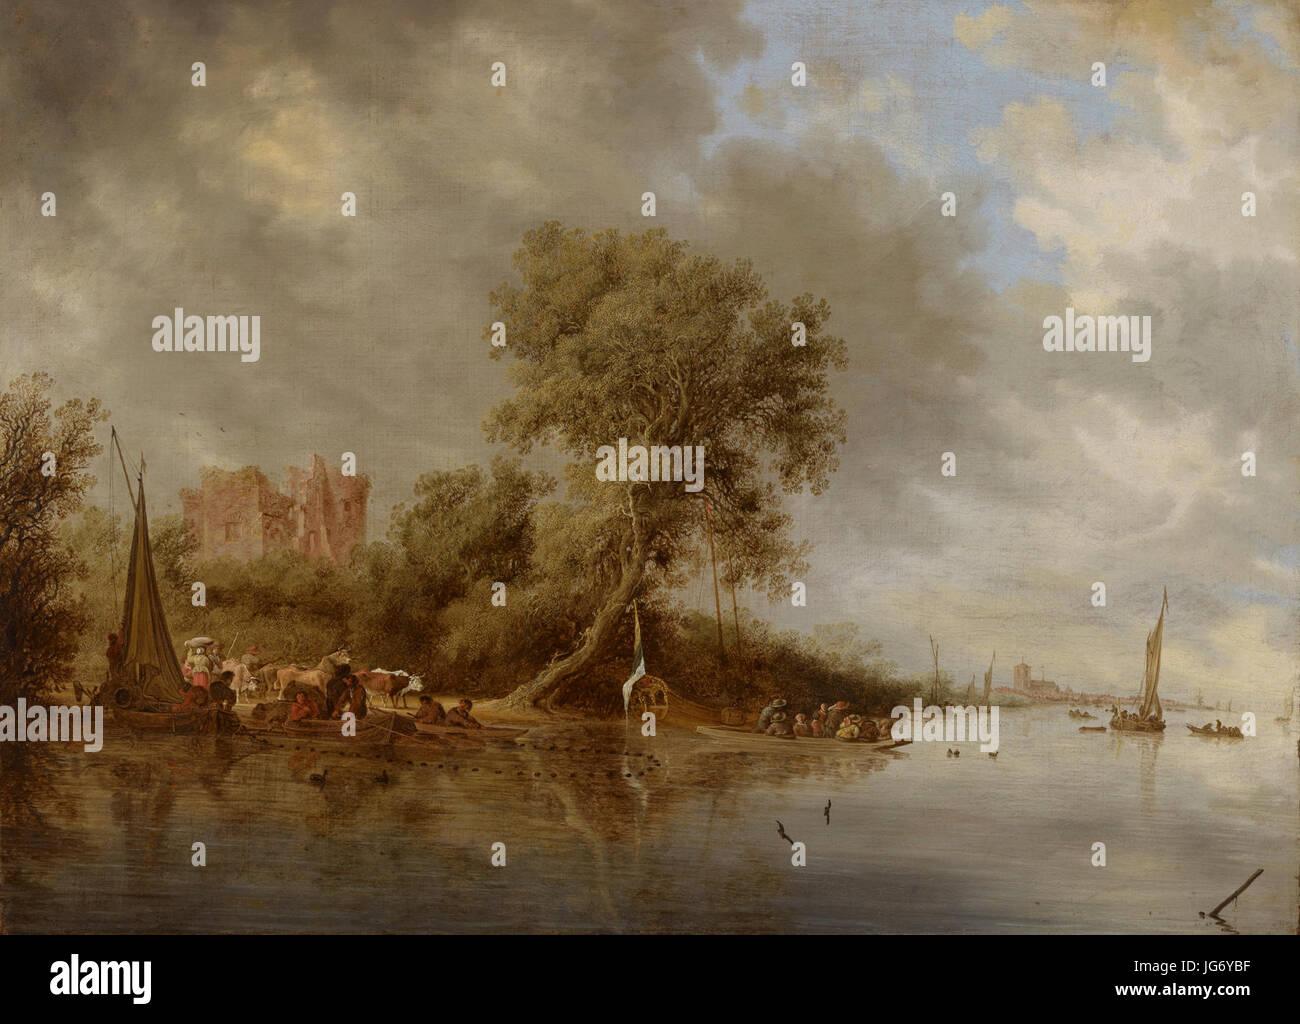 Salomon Jacobsz. van Ruysdael (1600-1603-1670)- River Landscape with the Ruins of the Castle of Egmond - Jokimaisema, Egmondin linnan raunio - Flodlandskap, slottet Egmonds ruiner (28845490893) Stock Photo